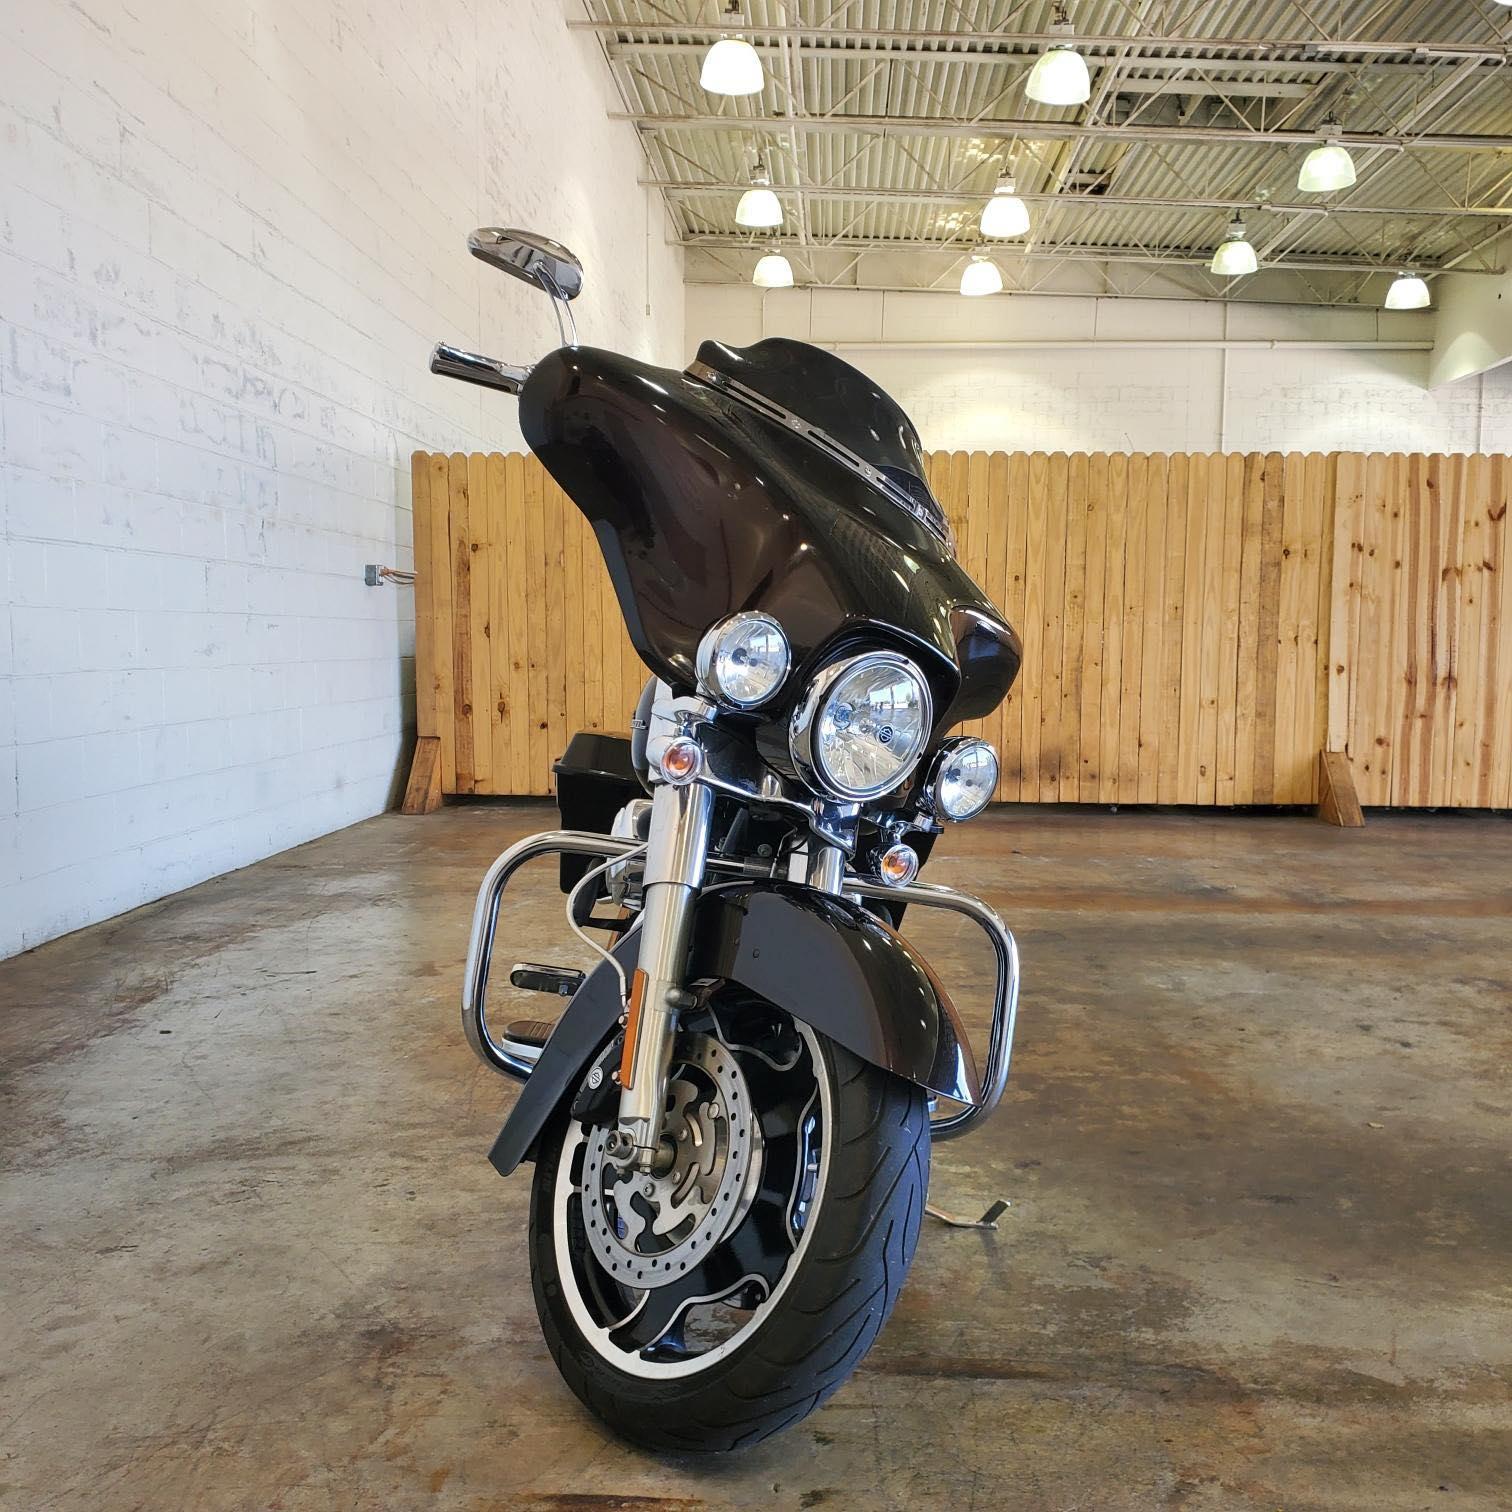 2011 Harley-Davidson Street Glide Base at Twisted Cycles